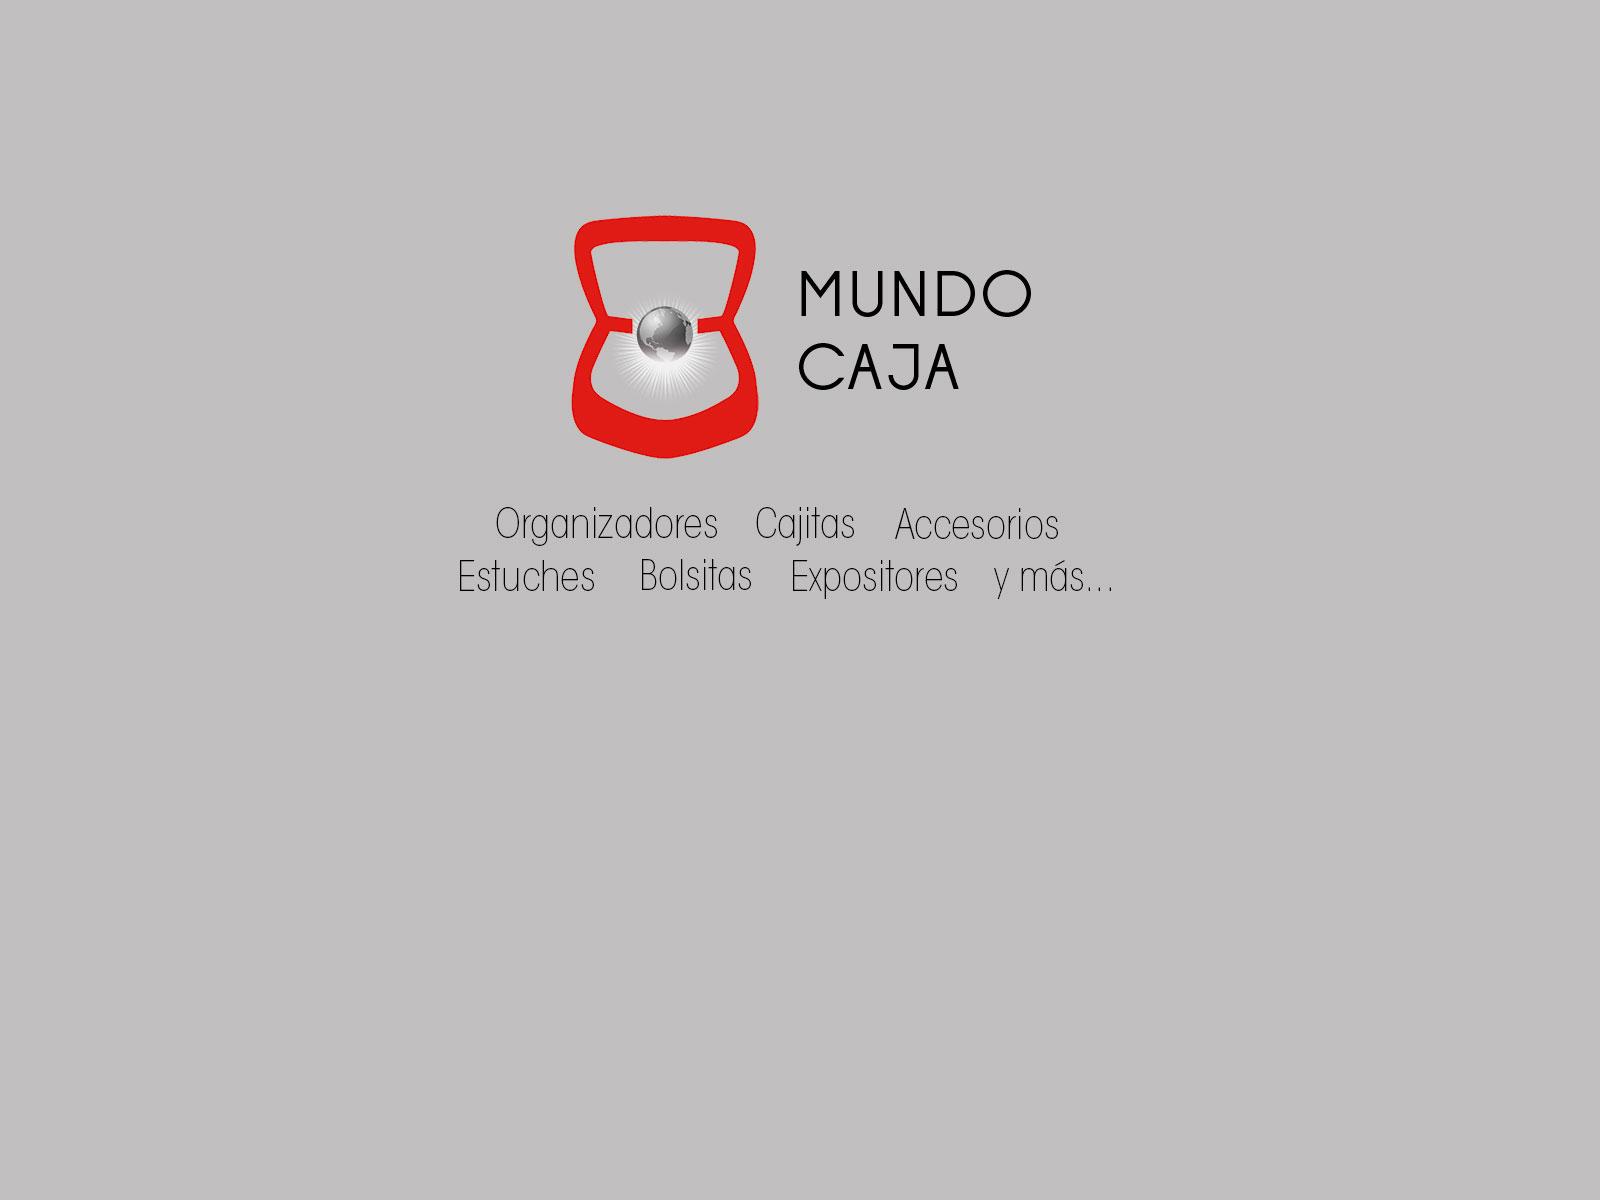 Mundo Caja